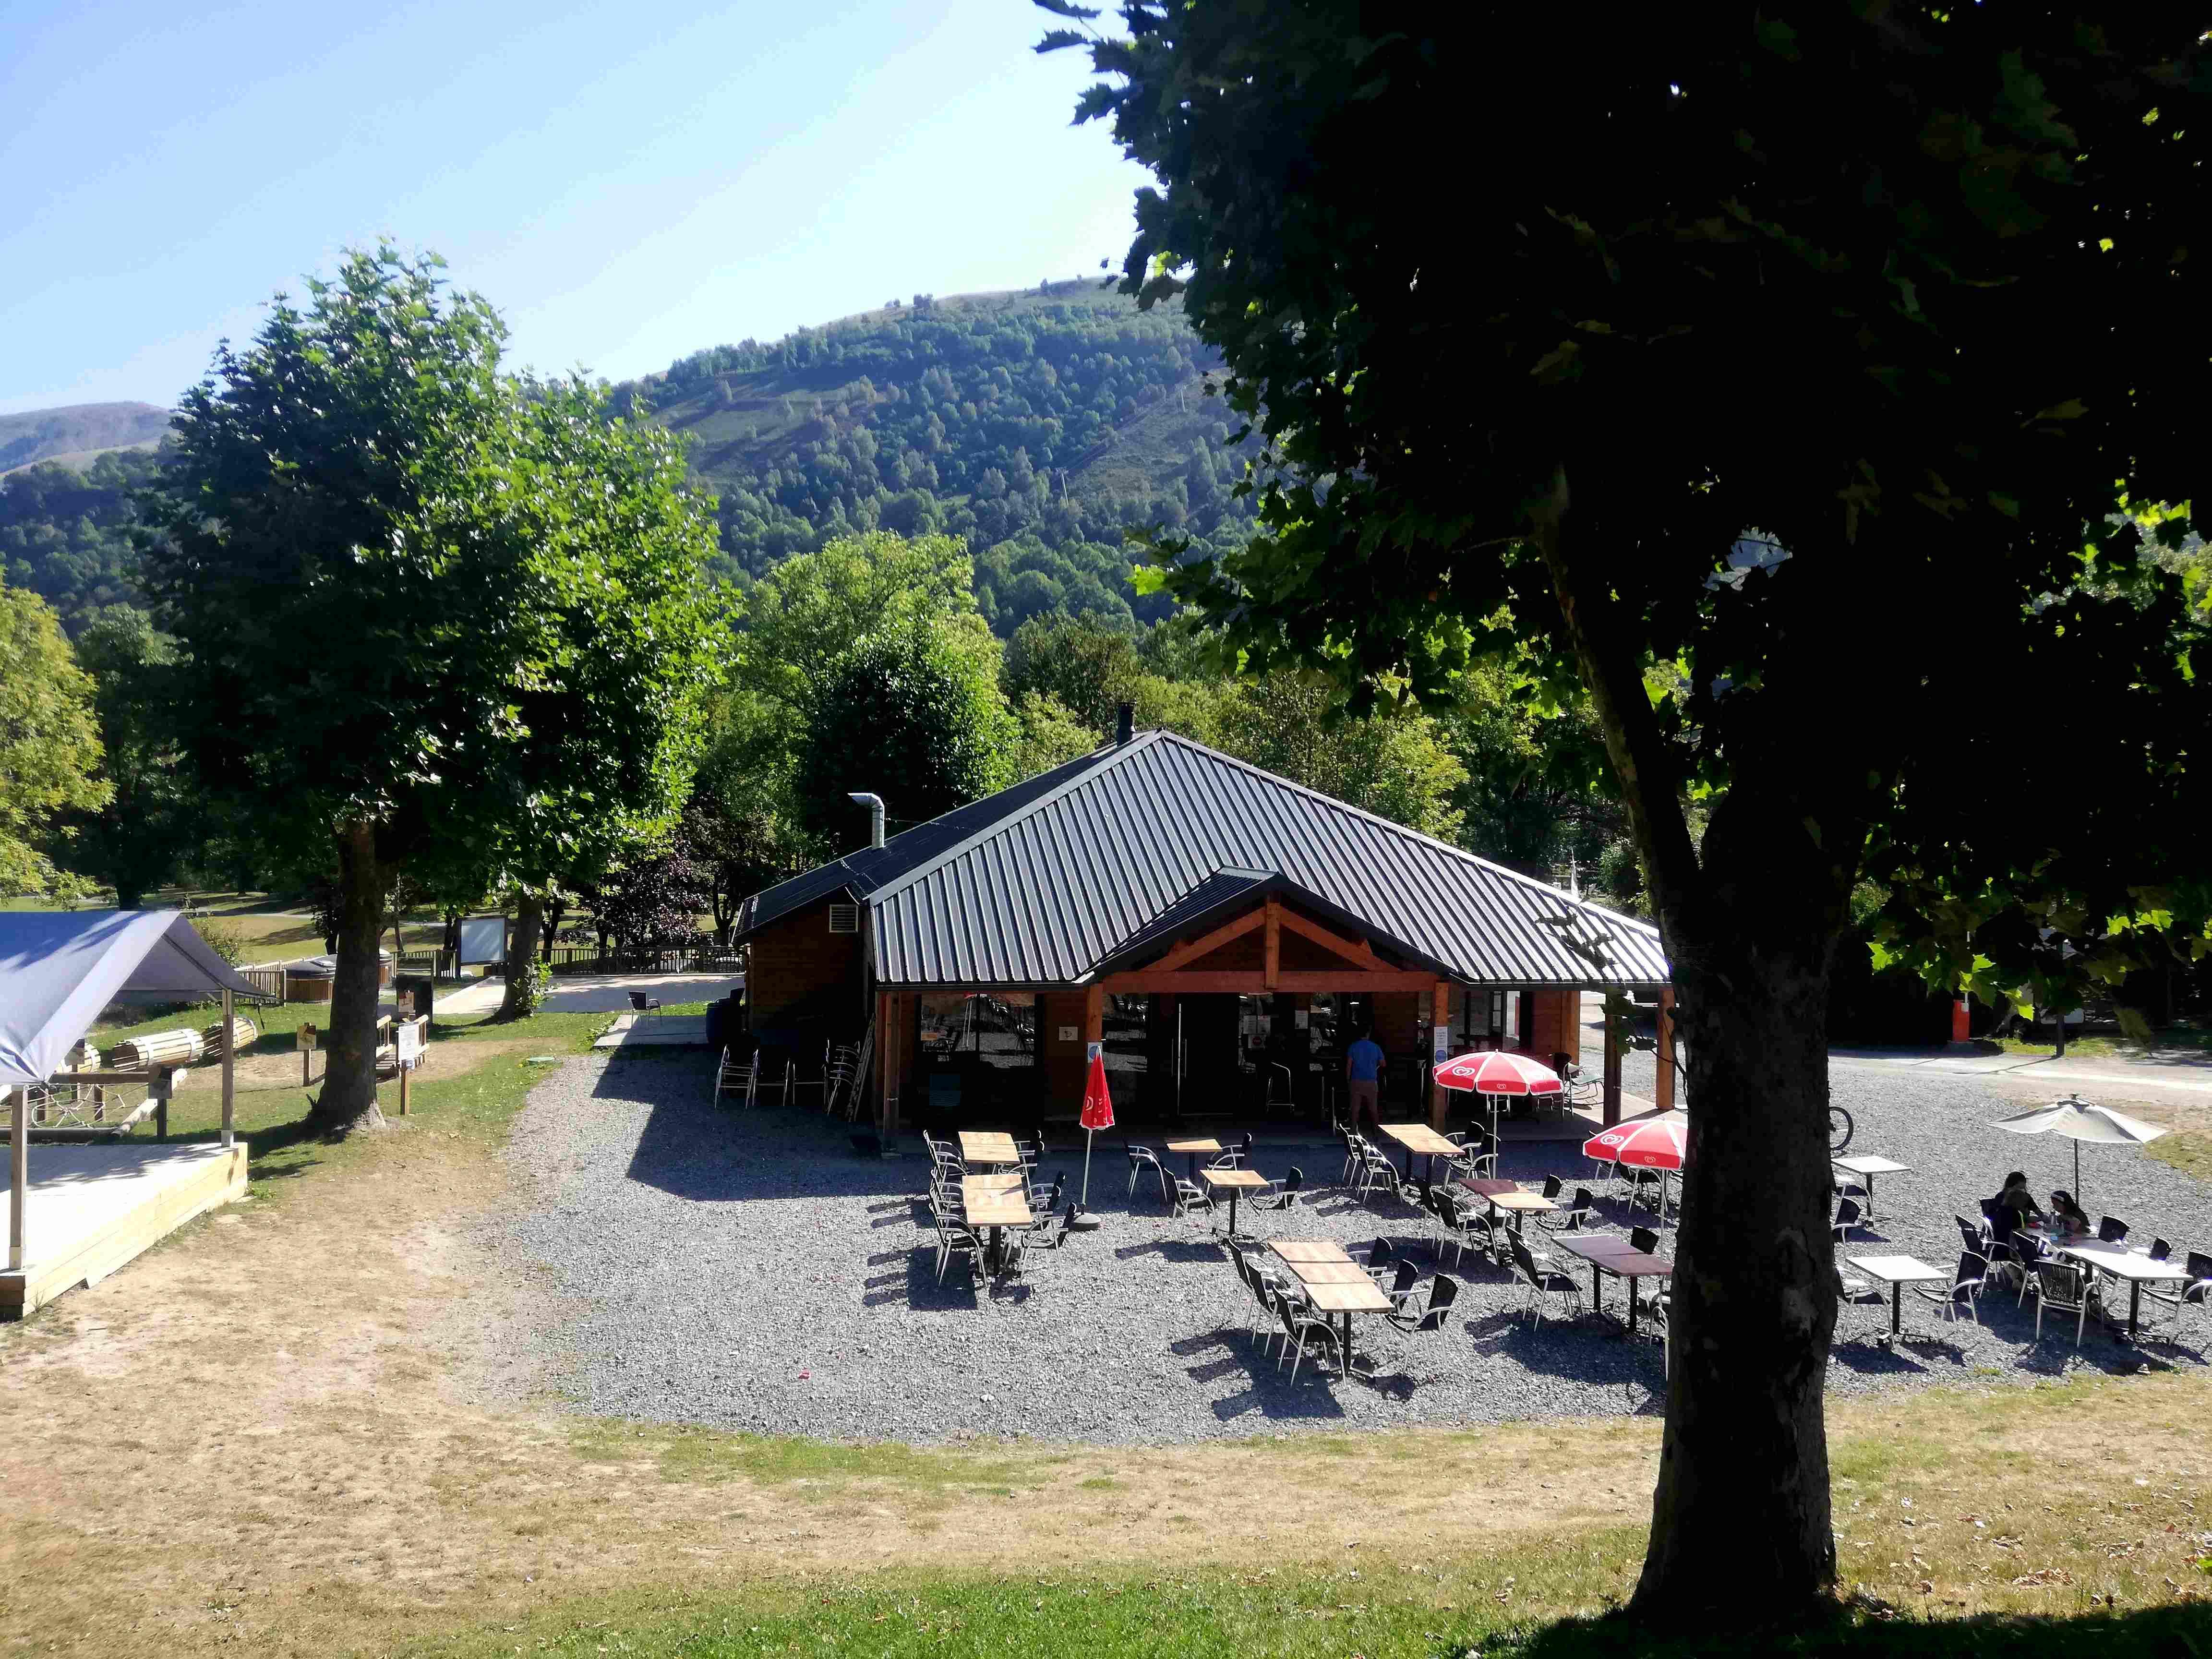 Wellness Sport Camping Pene Blanche, Loudenvielle, Hautes-Pyrénées